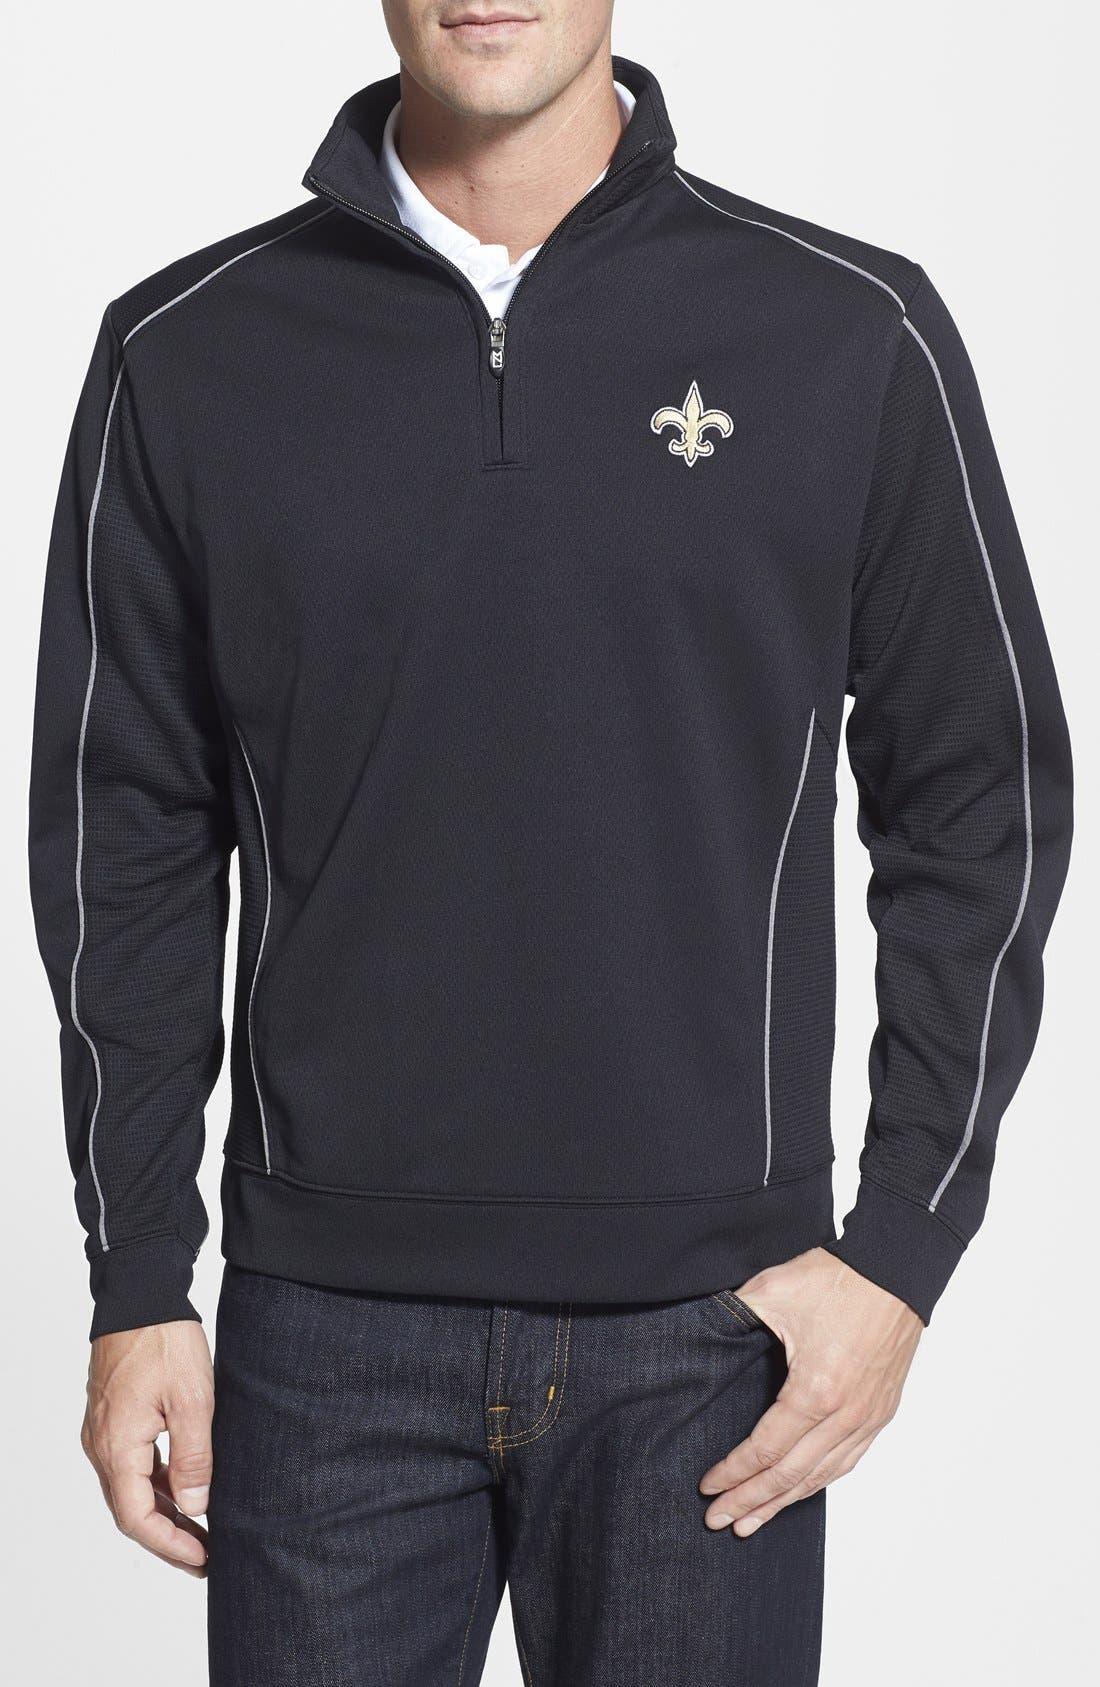 New Orleans Saints - Edge DryTec Moisture Wicking Half Zip Pullover,                         Main,                         color, 001